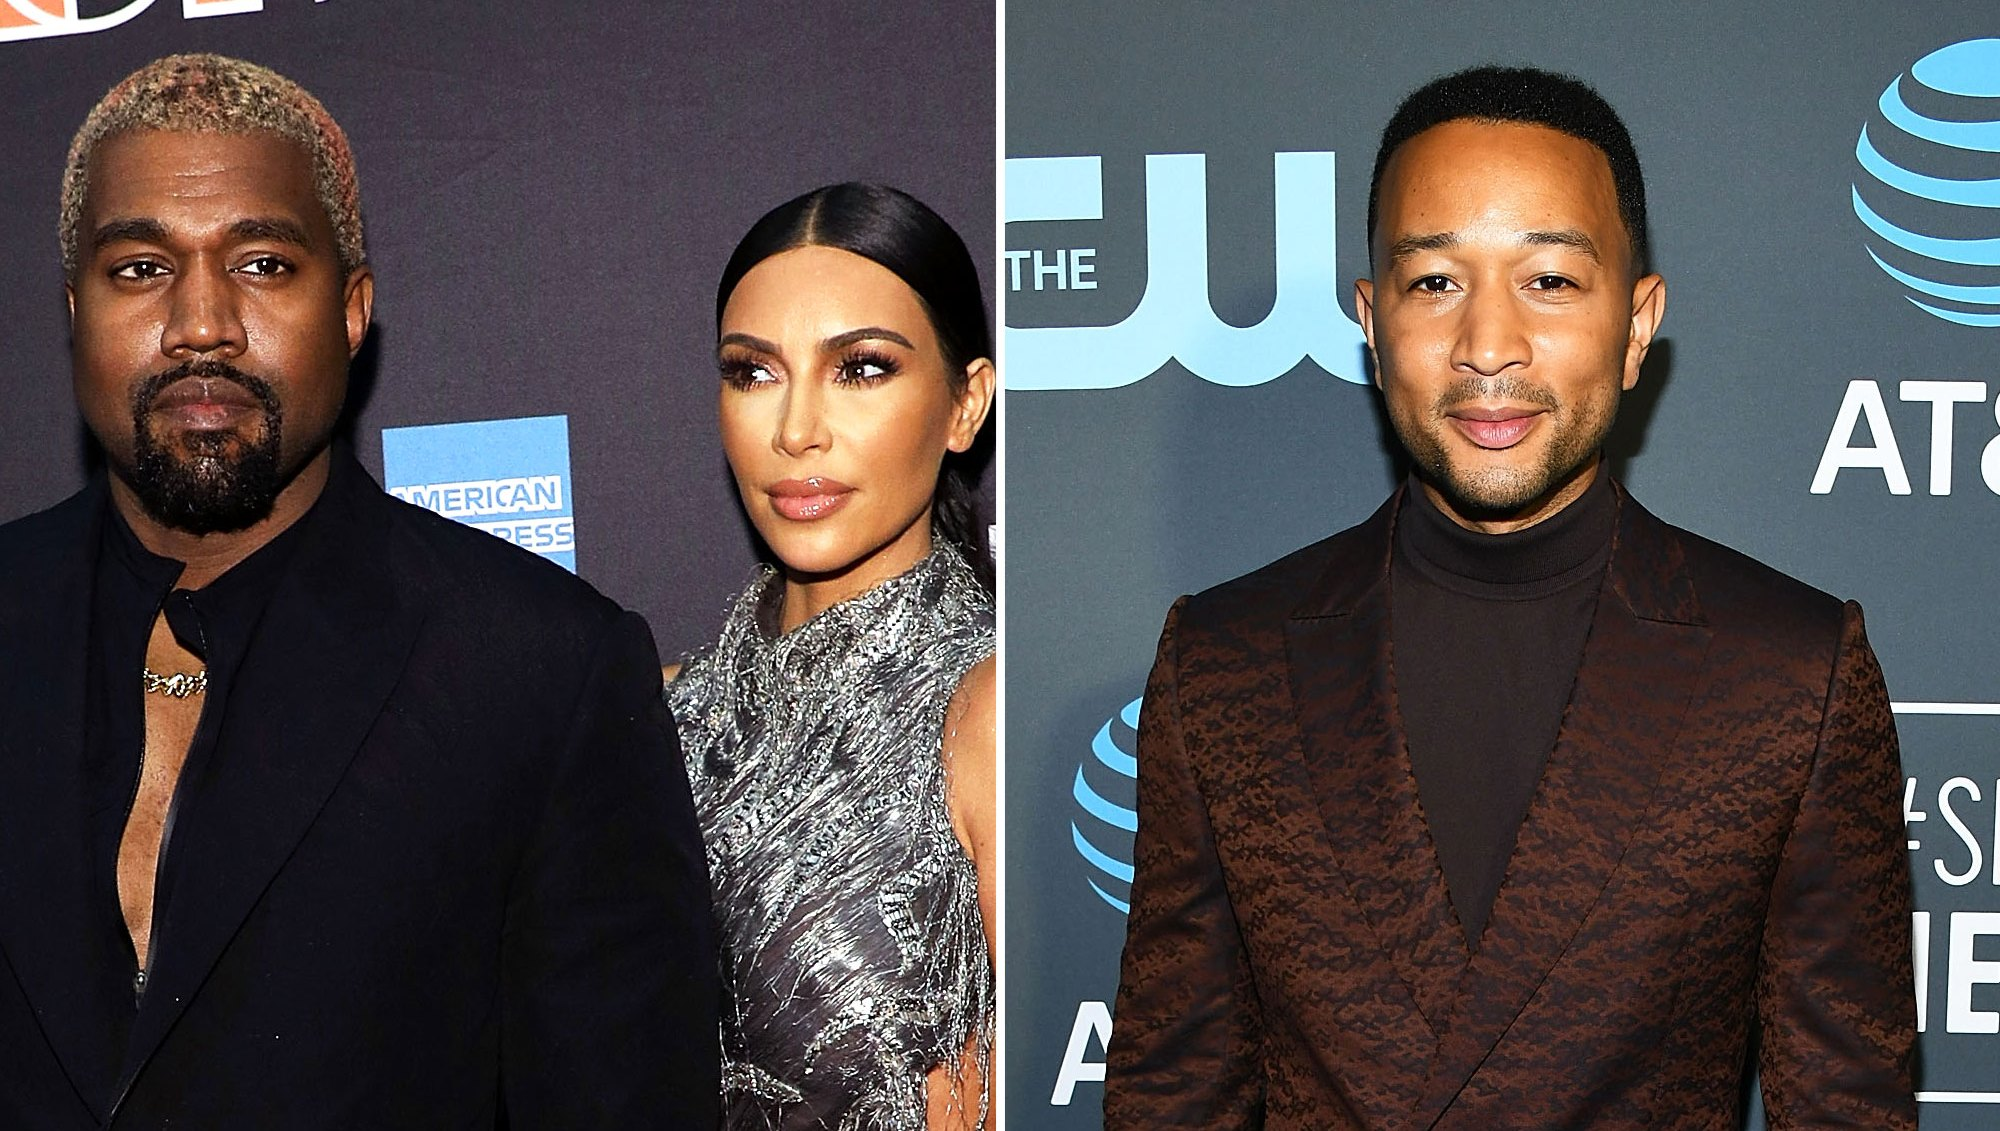 Kim Kardashian and Kanye West Pre-Gamed John Legend's 40th Birthday With Doughnuts